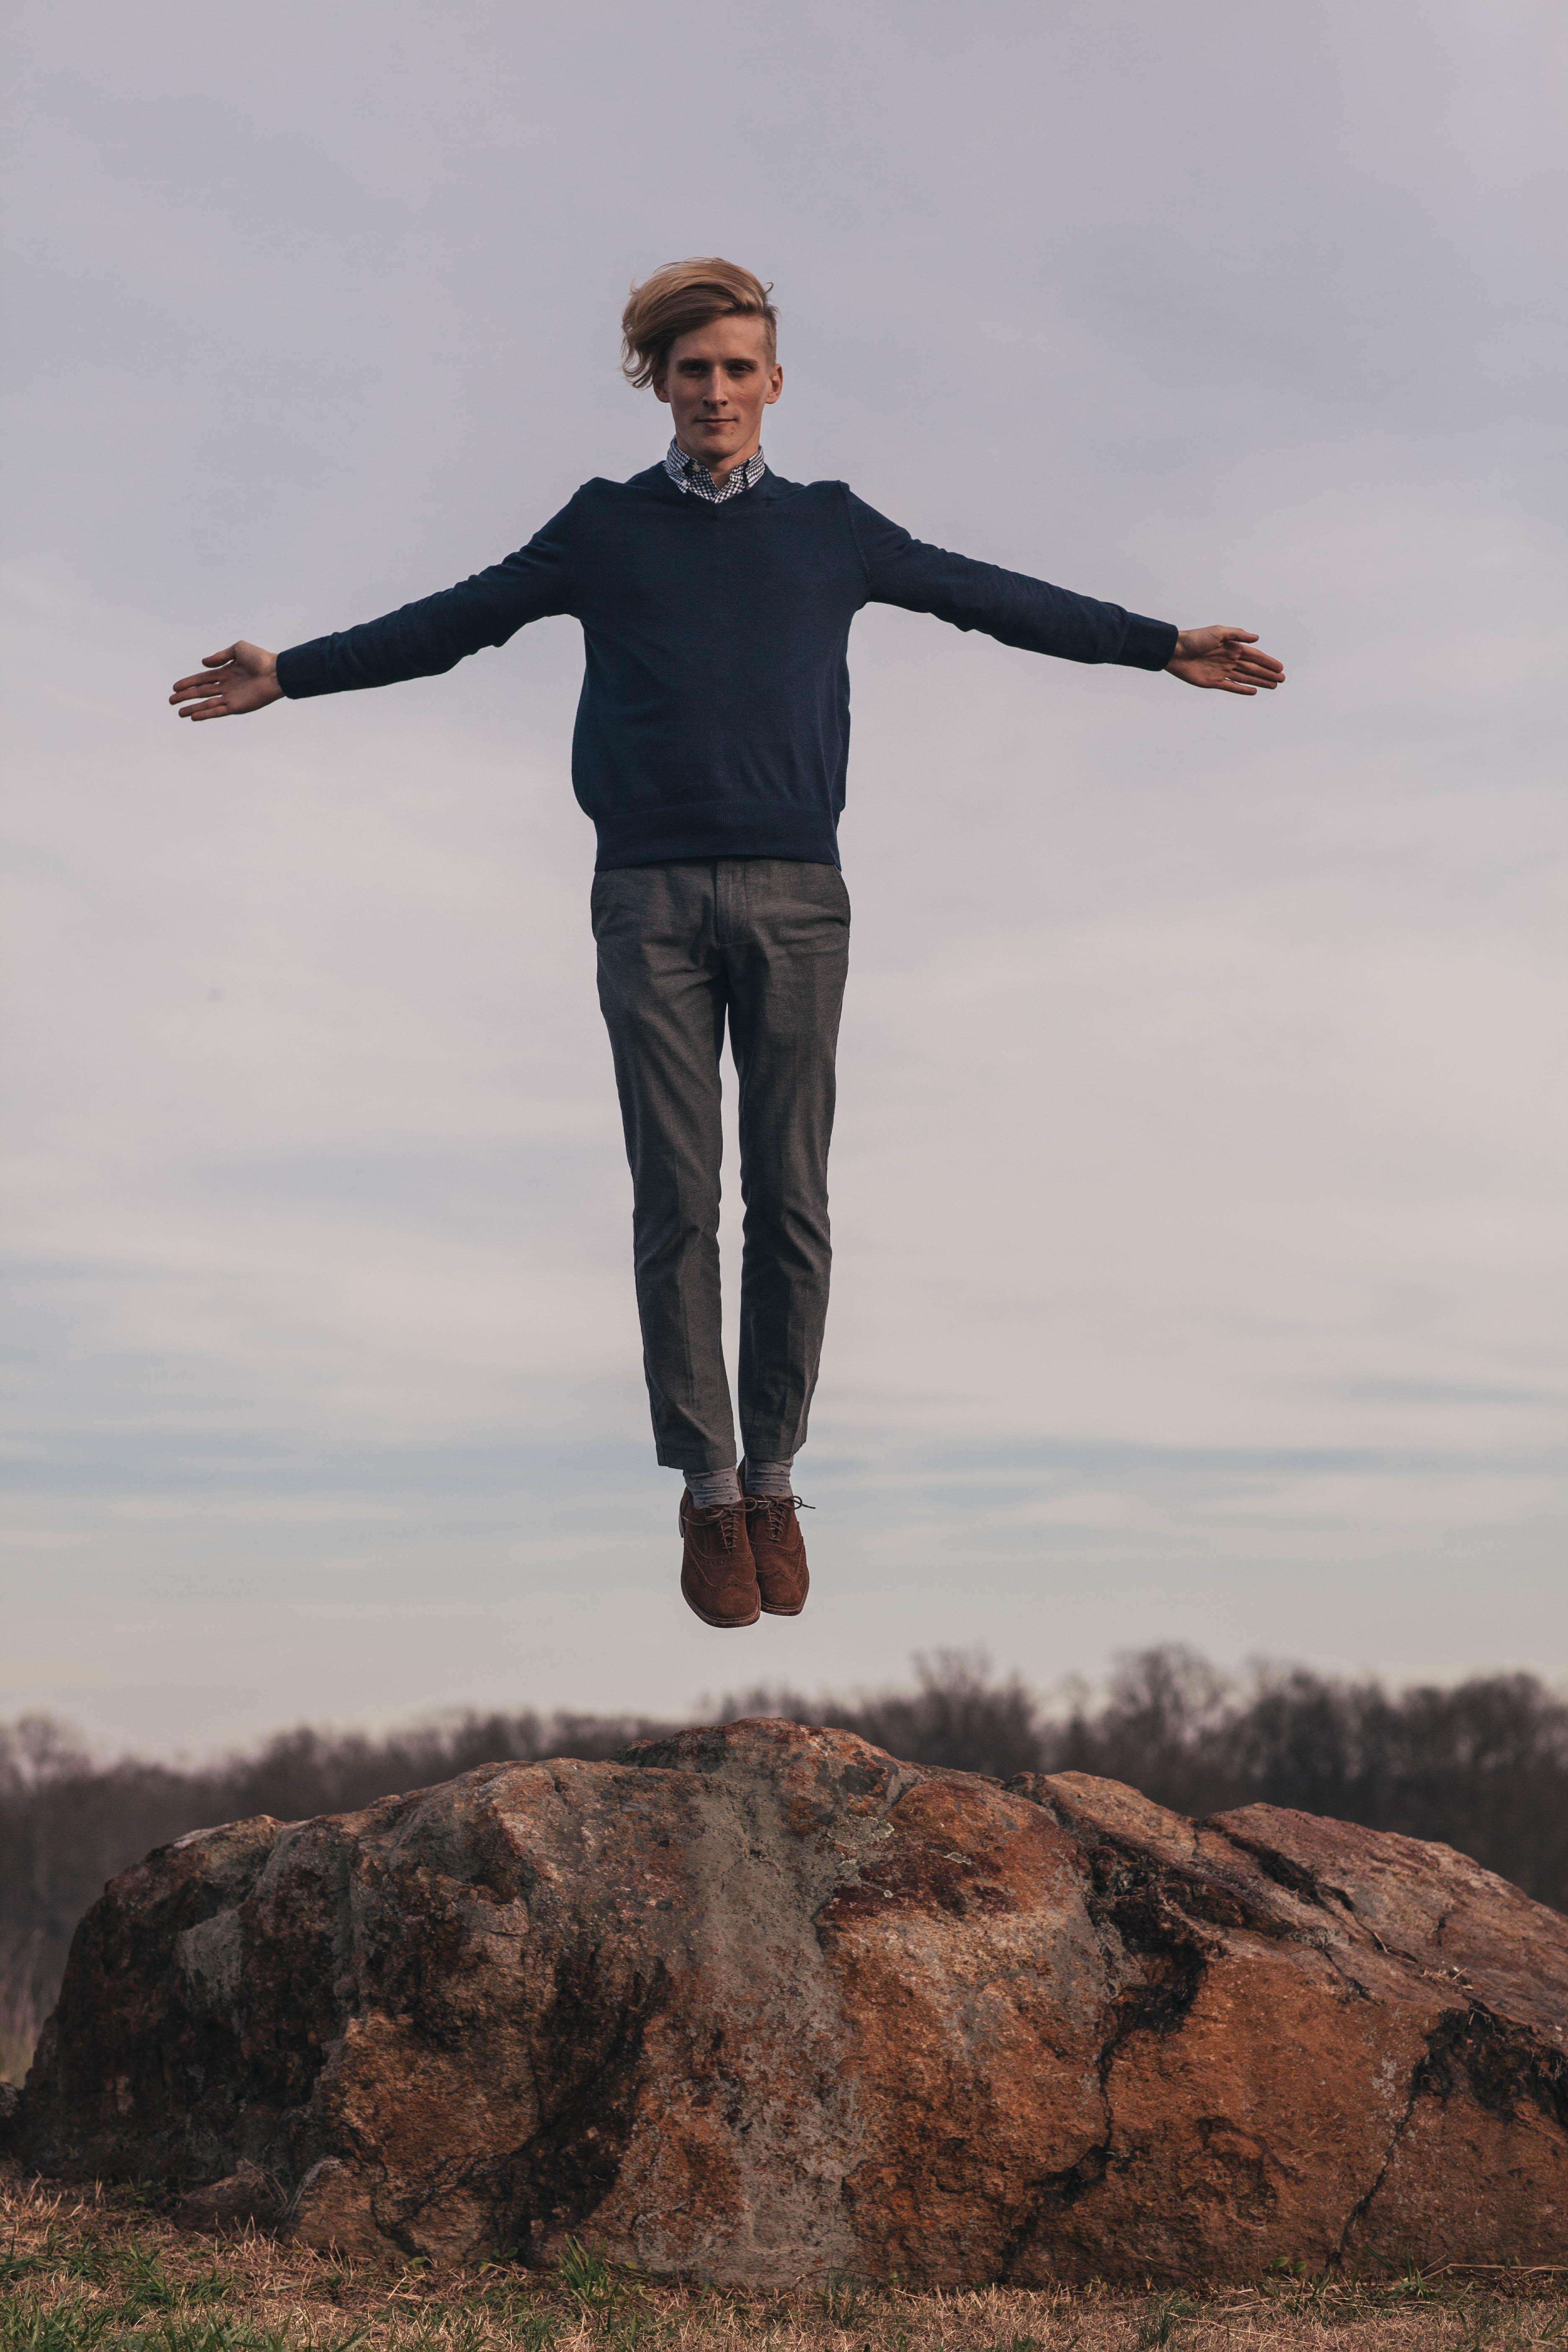 Free Images : jump, levitate, man, model, rock 3744x5616 ...